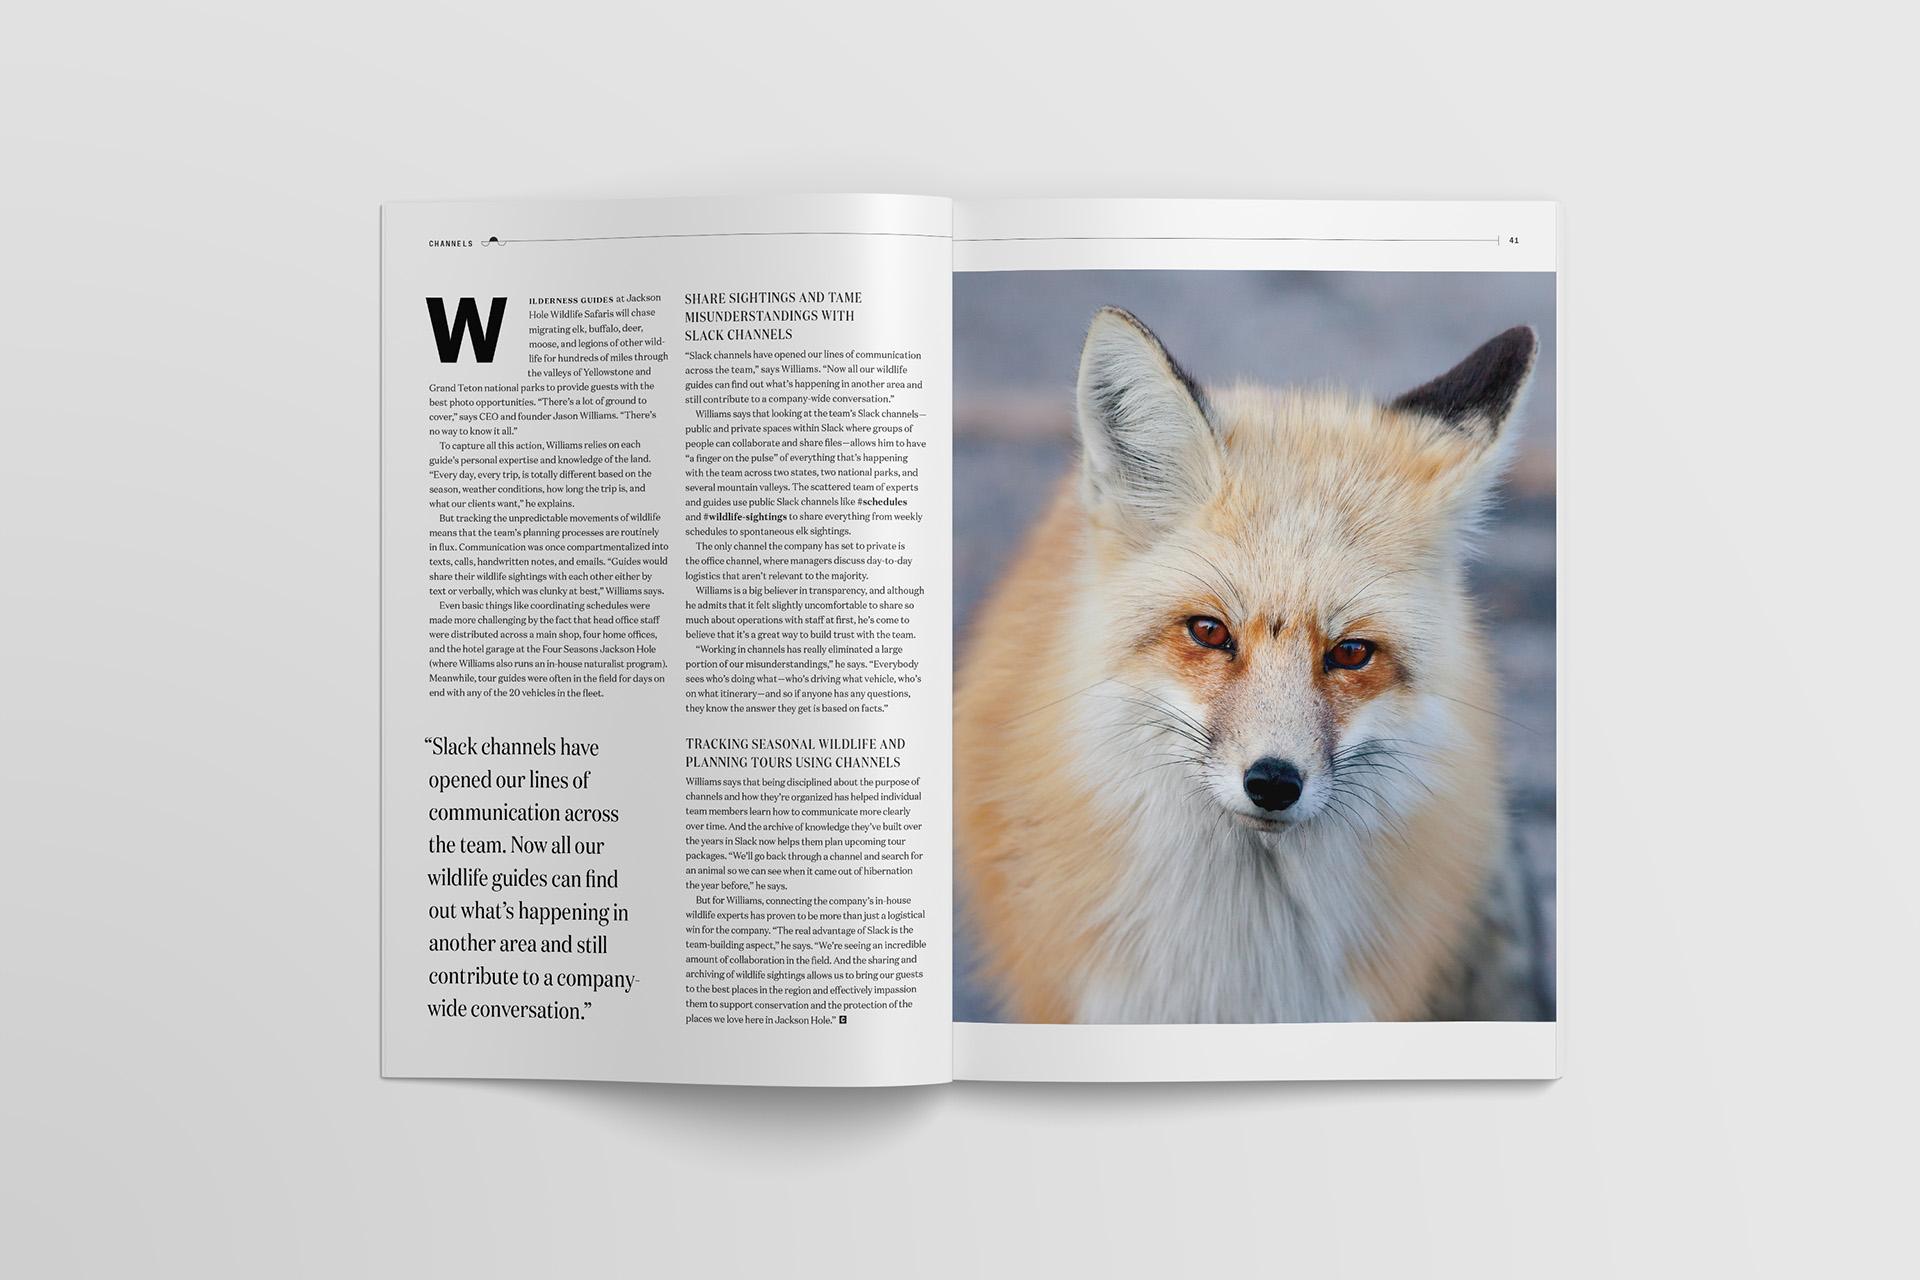 Slack Channels Wildlife Sightings Photo Essay 02